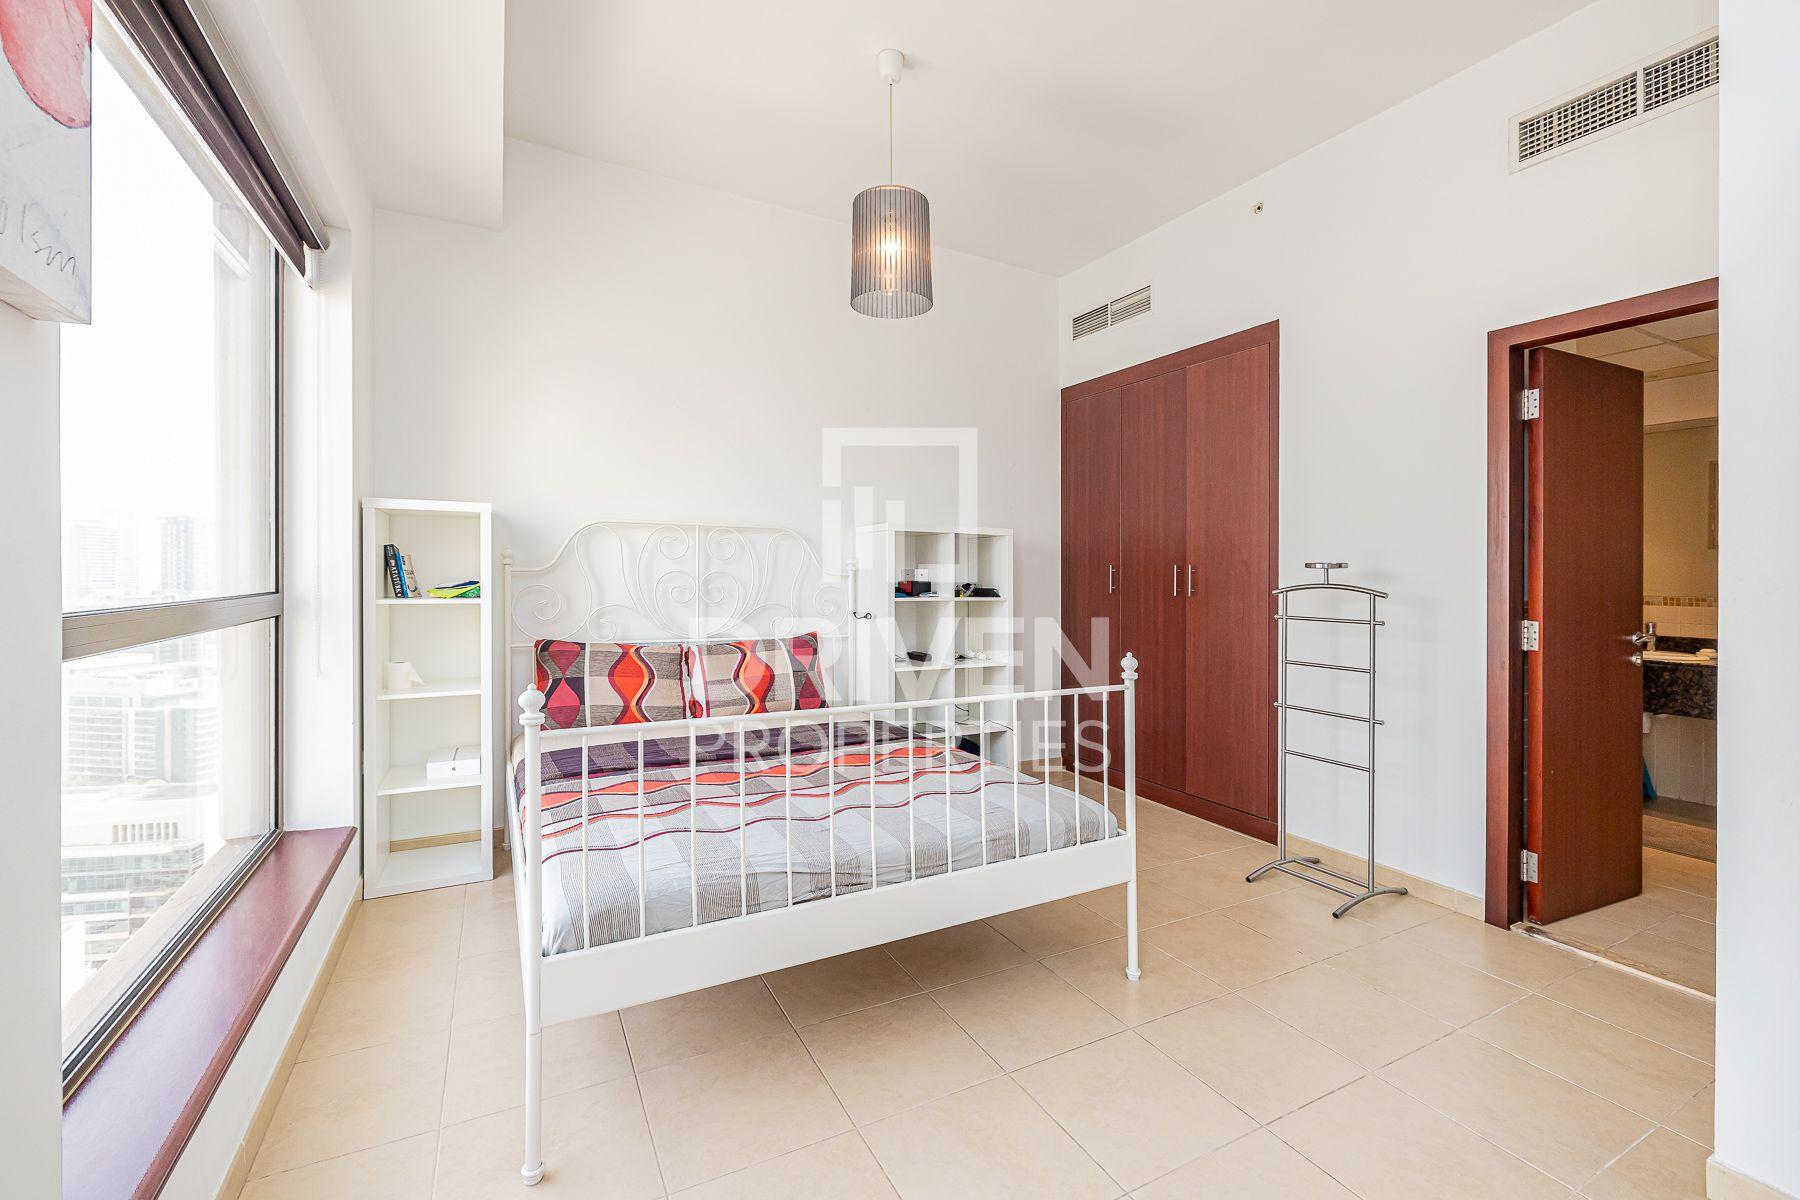 Apartment for Rent in Bahar 6 - Jumeirah Beach Residence